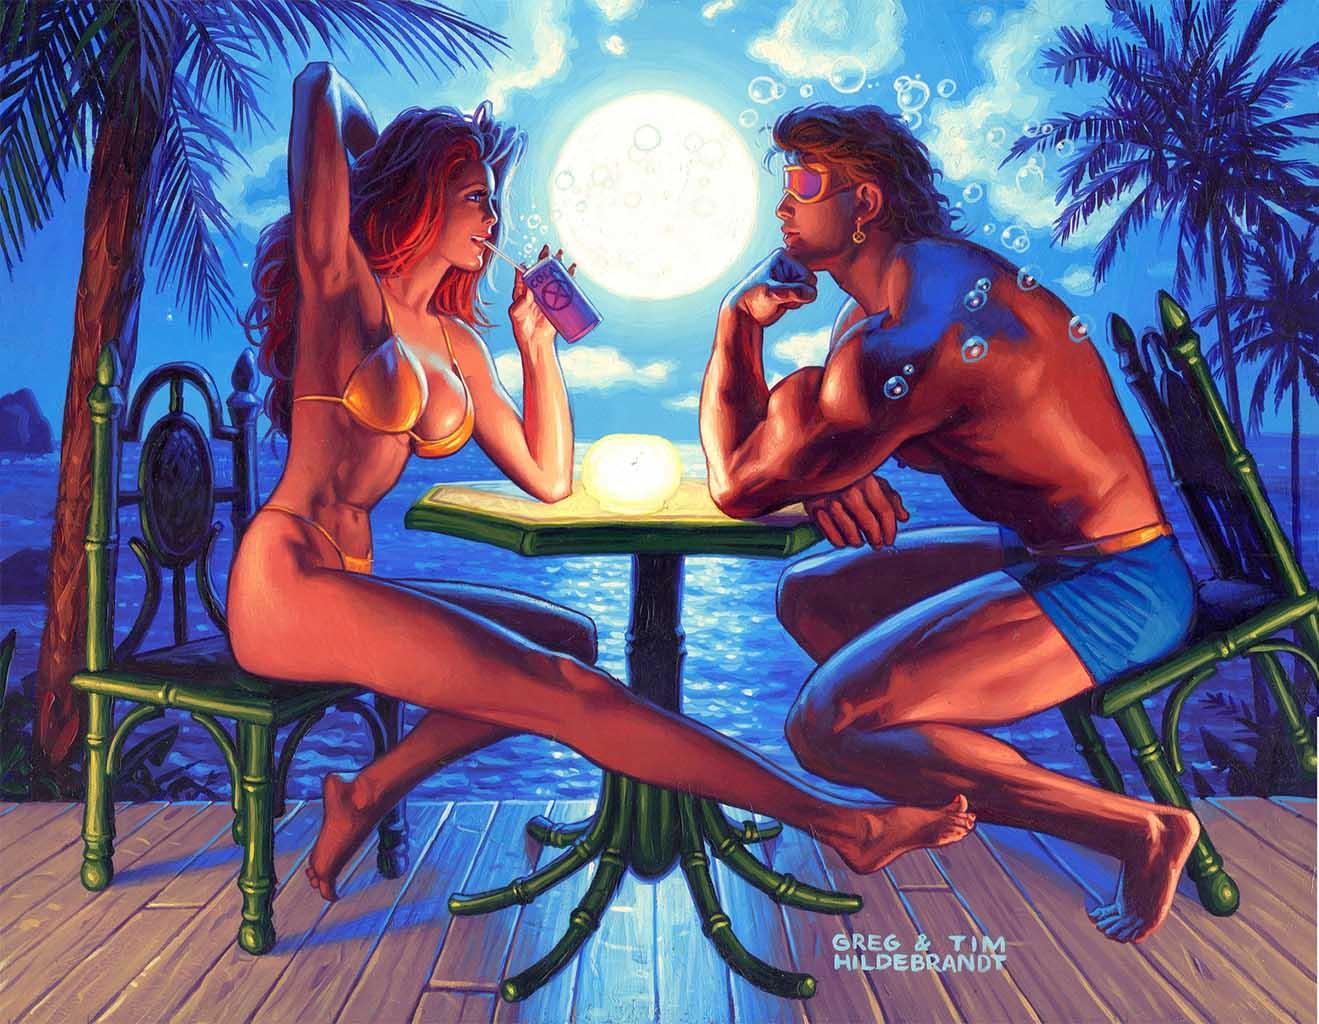 Грег Хильдебрандт (Greg Hildebrandt), Jean and Scott Marvel Swimsuit painting